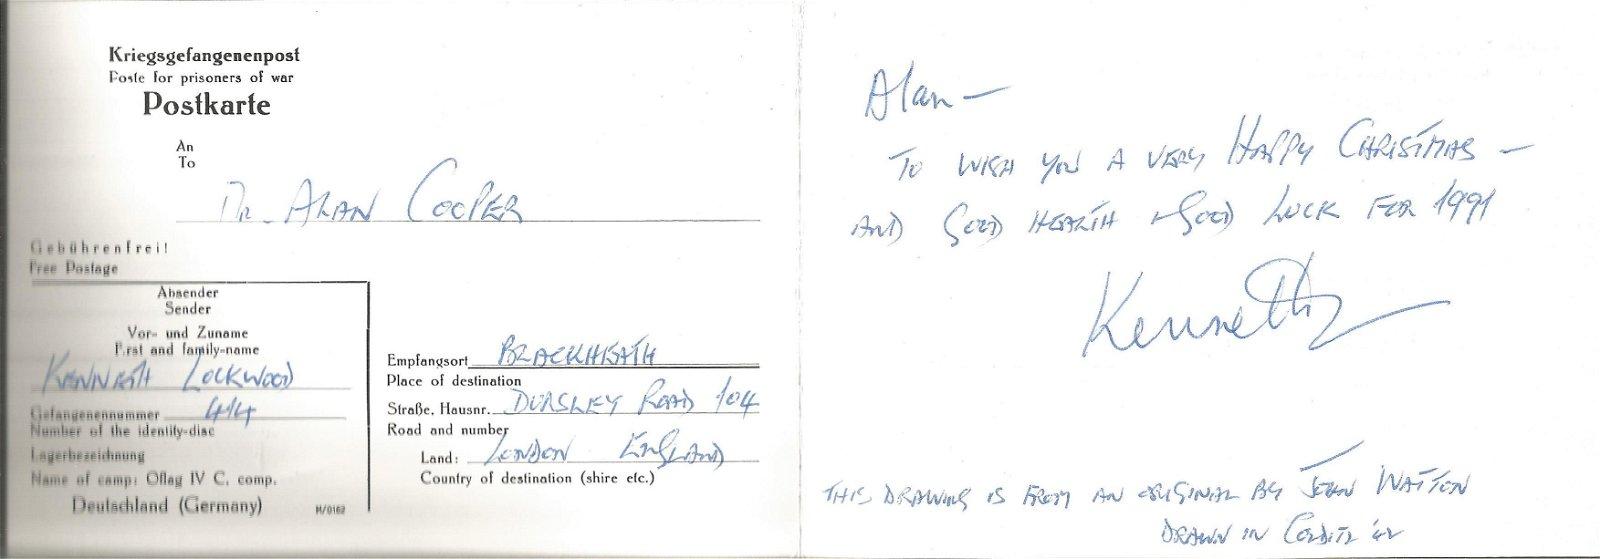 WW2 Colditz inmate Kenneth Lockwood signed Christmas